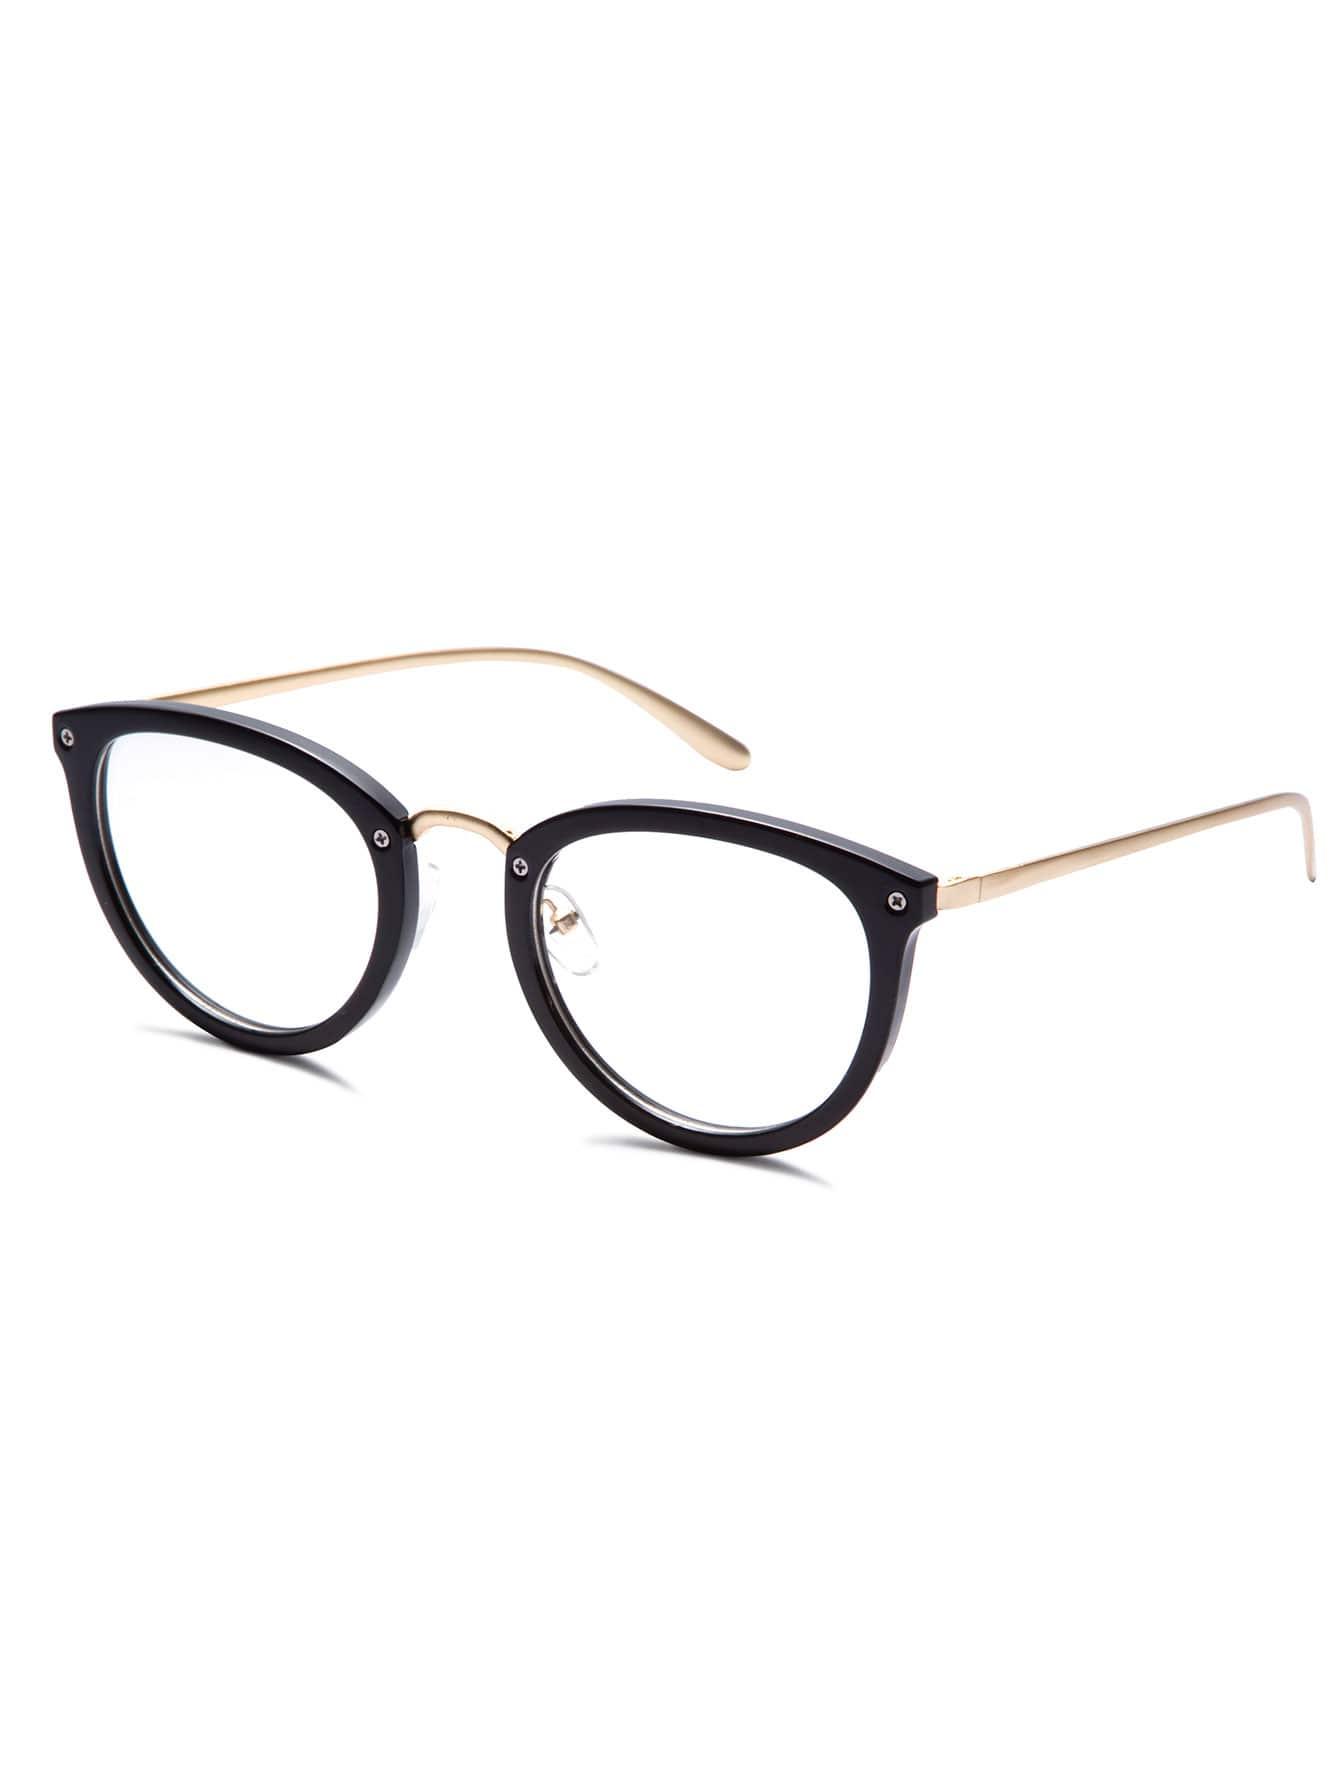 Shiny Black Frame Gold Arm Glasses -SheIn(Sheinside)